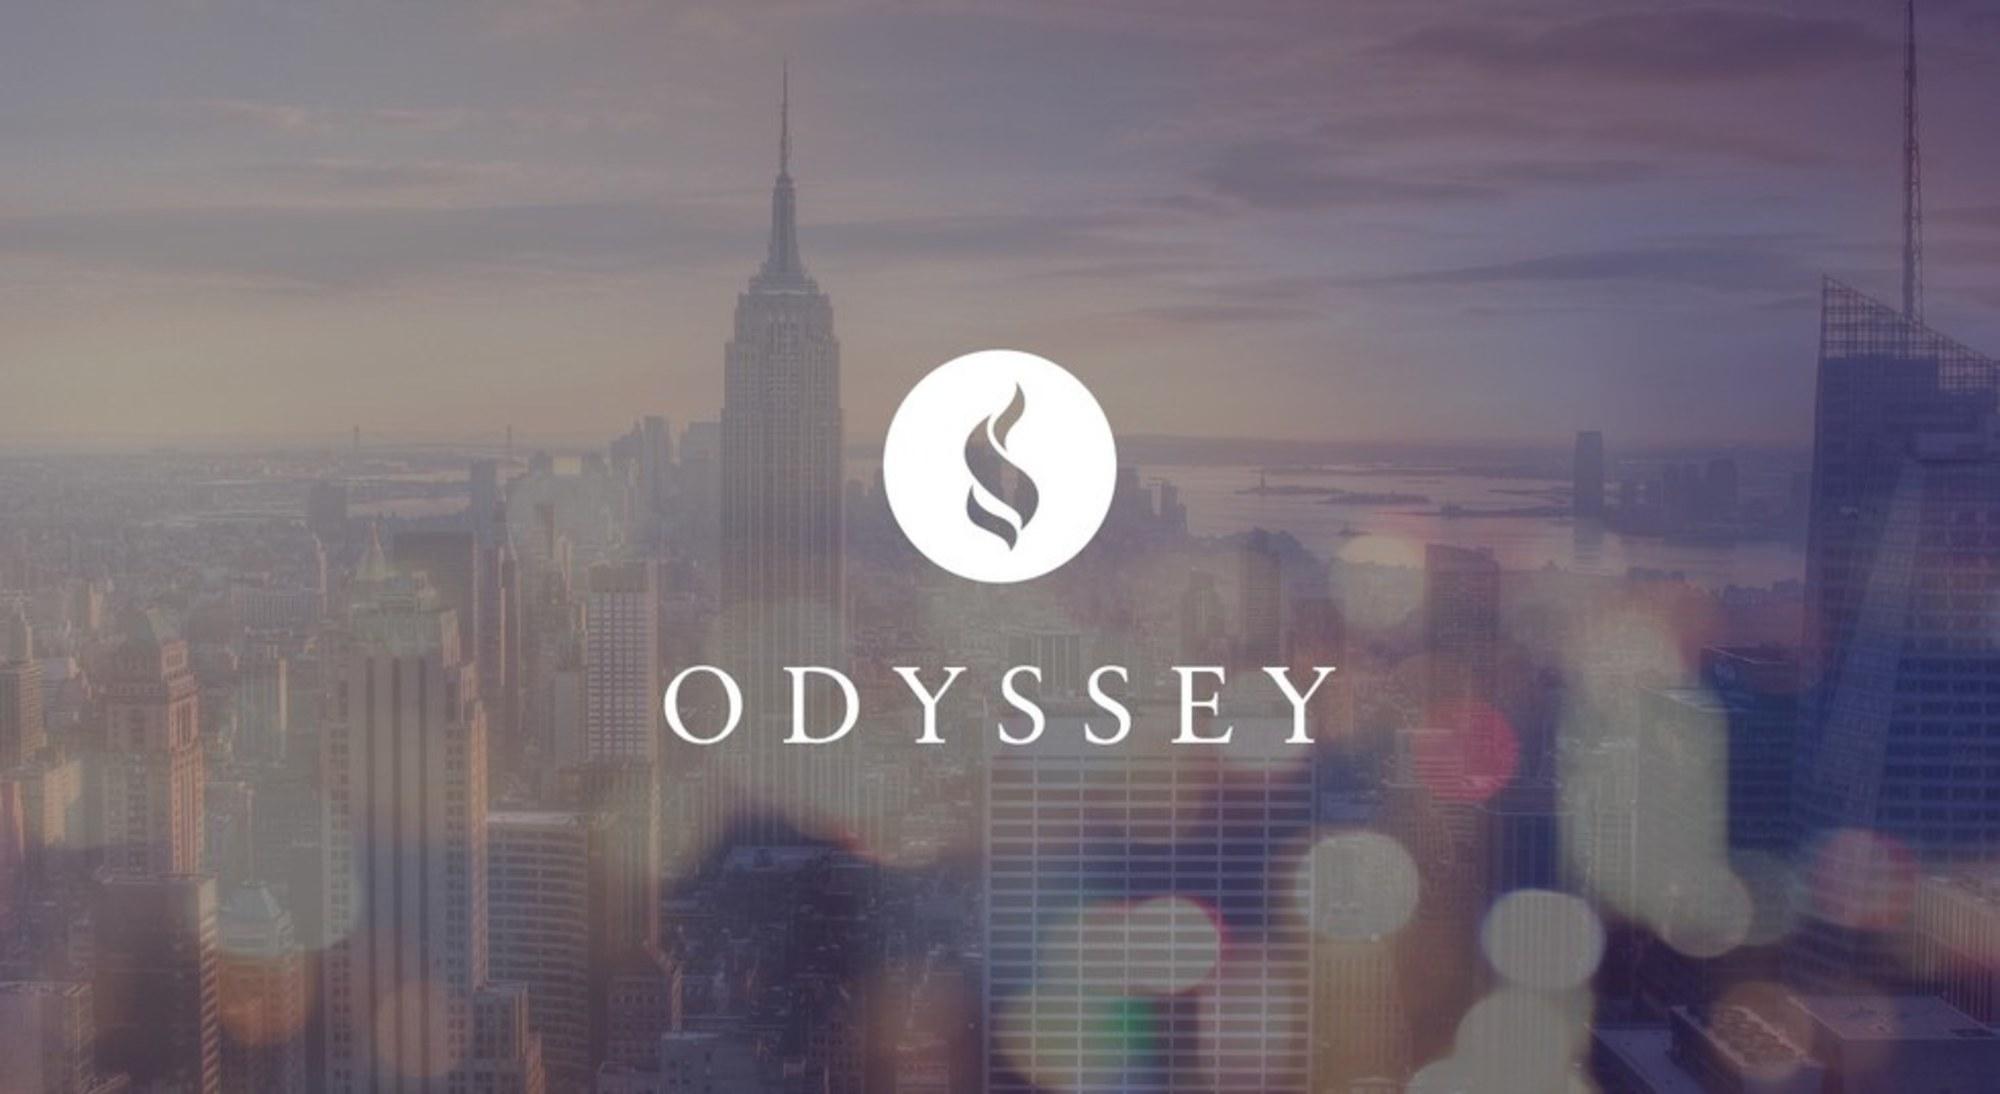 Publish Guest Post On Theodysseyonline. com